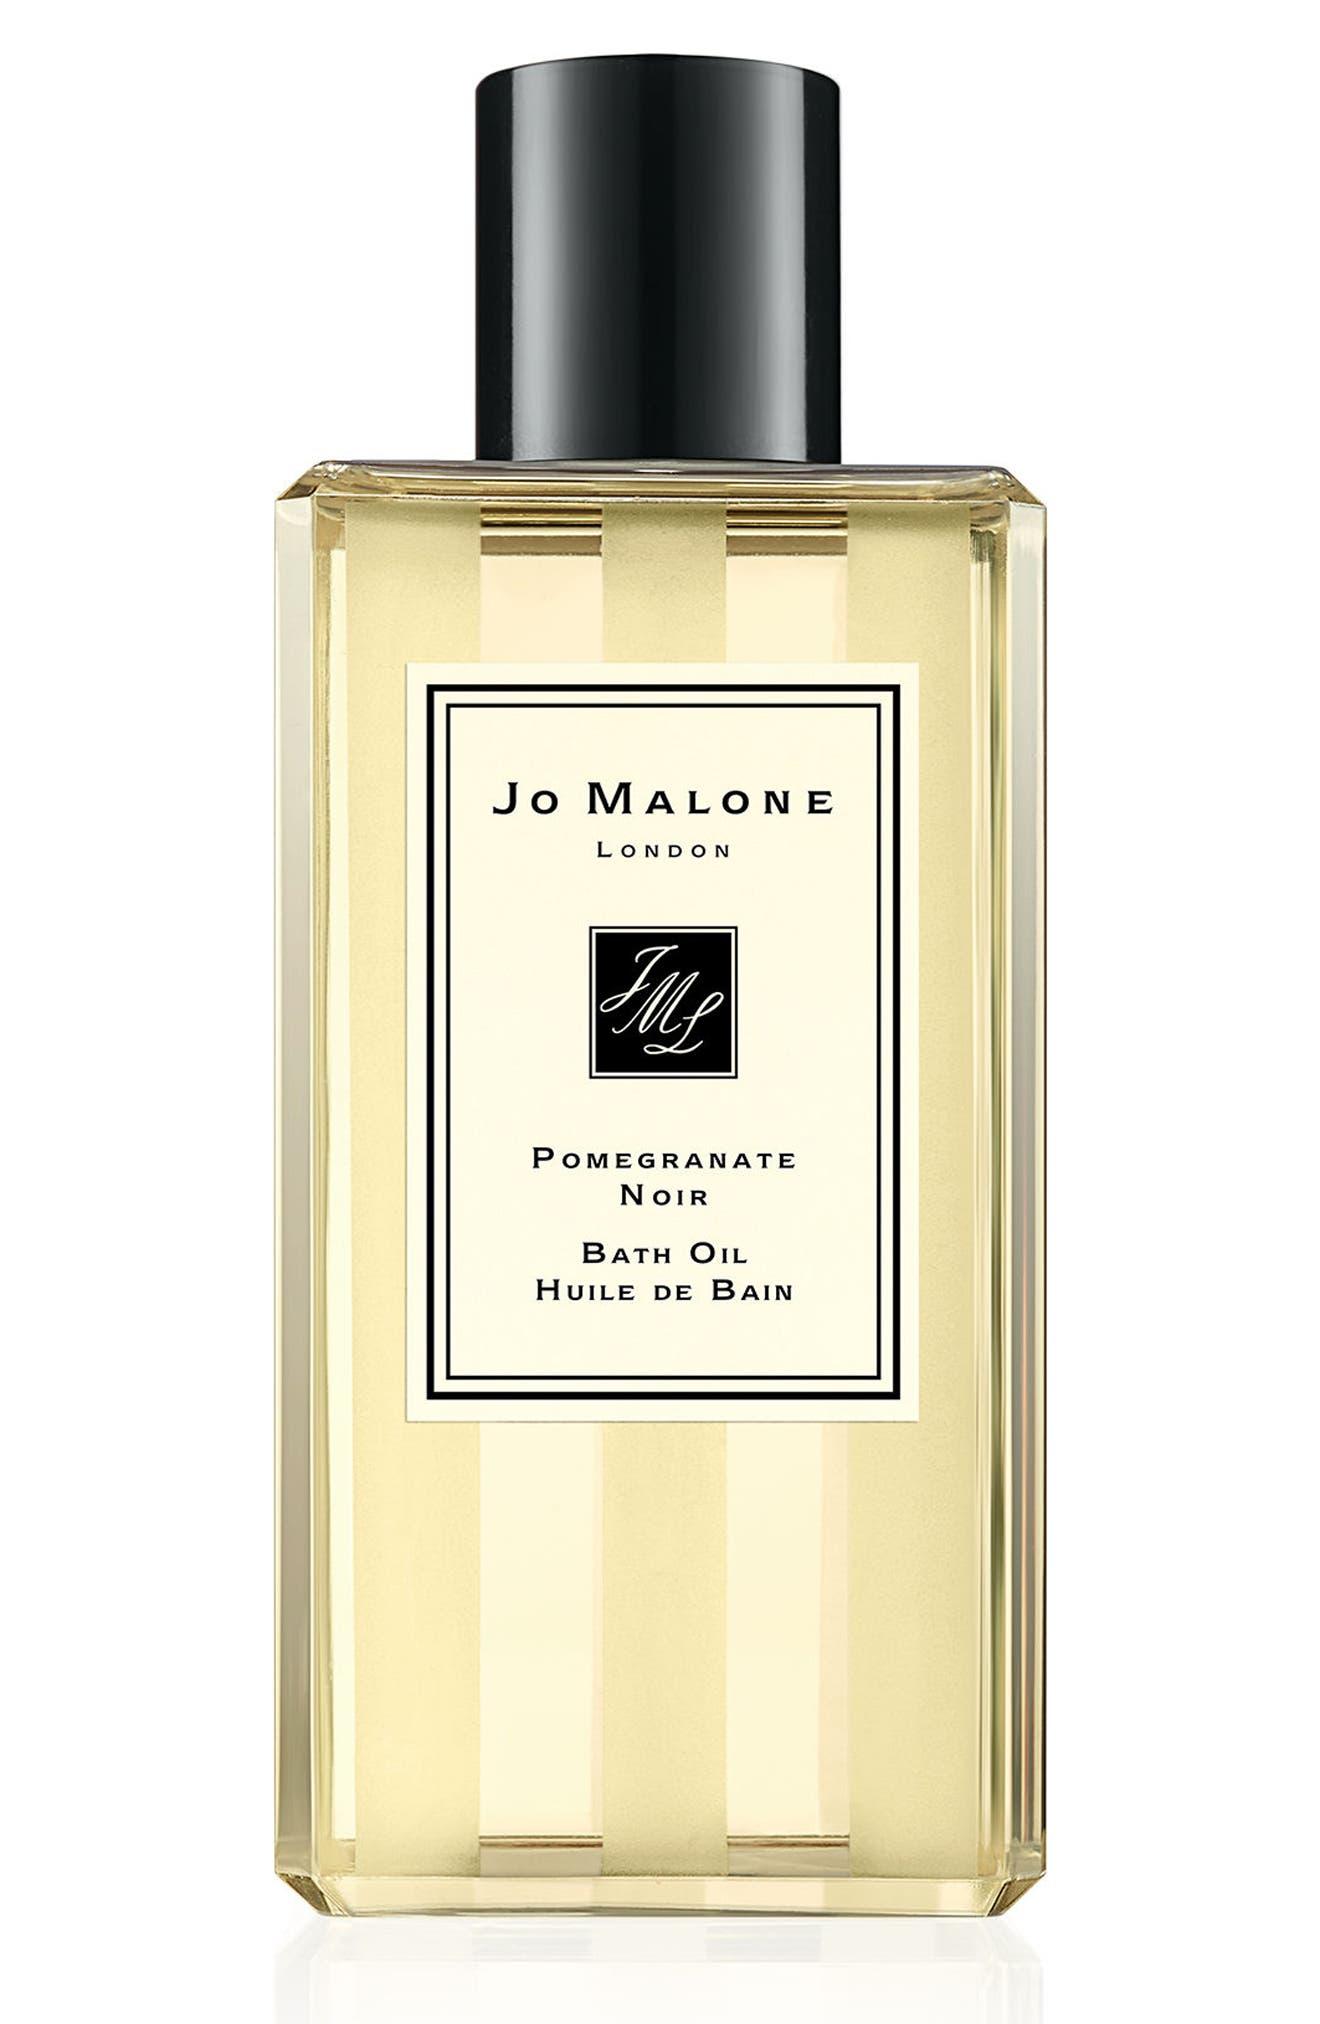 Jo Malone 'Pomegranate Noir' Bath Oil